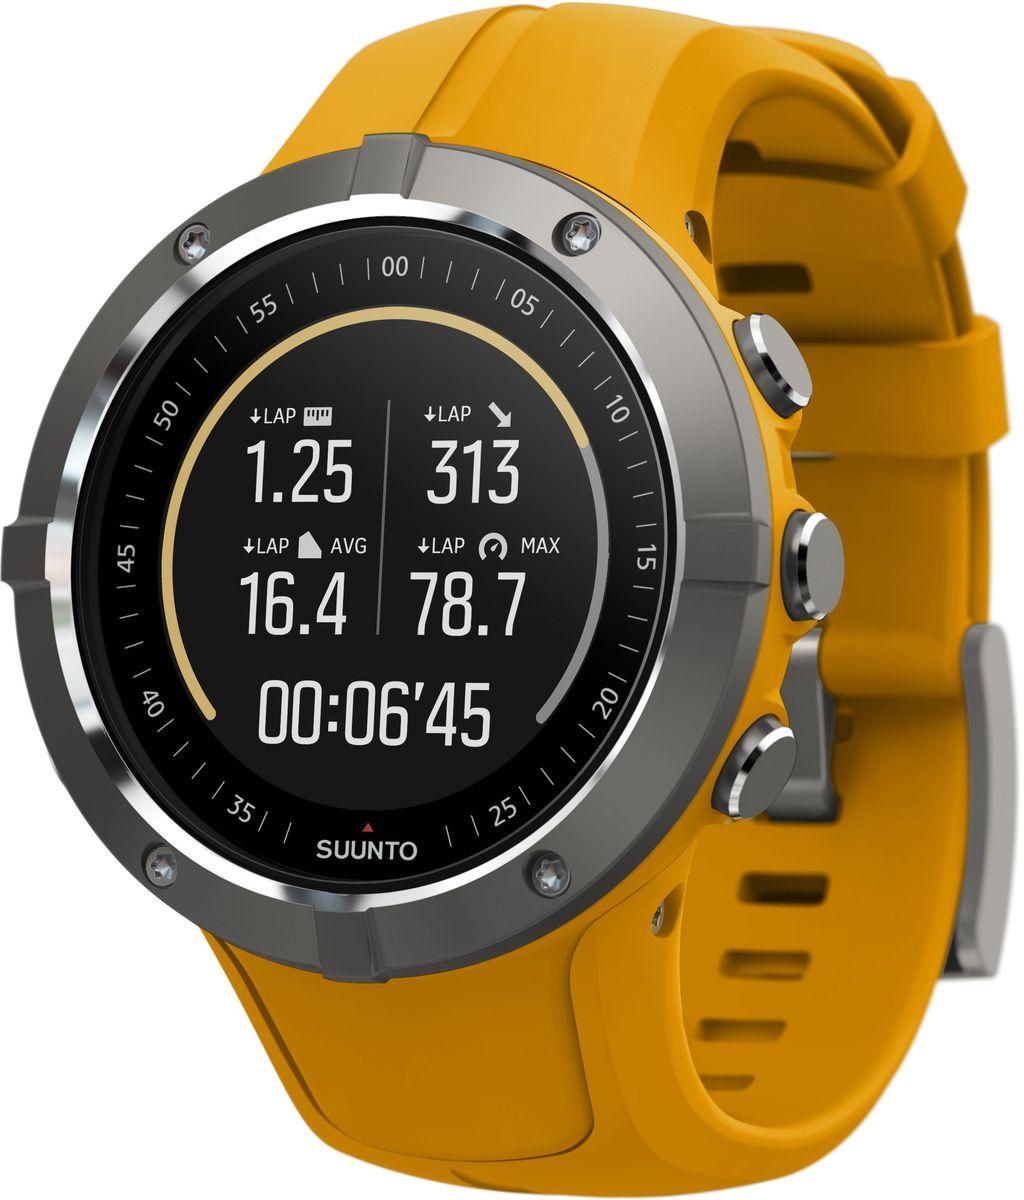 Часы спортивные Suunto  Spartan Trainer Wrist HR Amber , цвет: желтый, черный - Умные часы